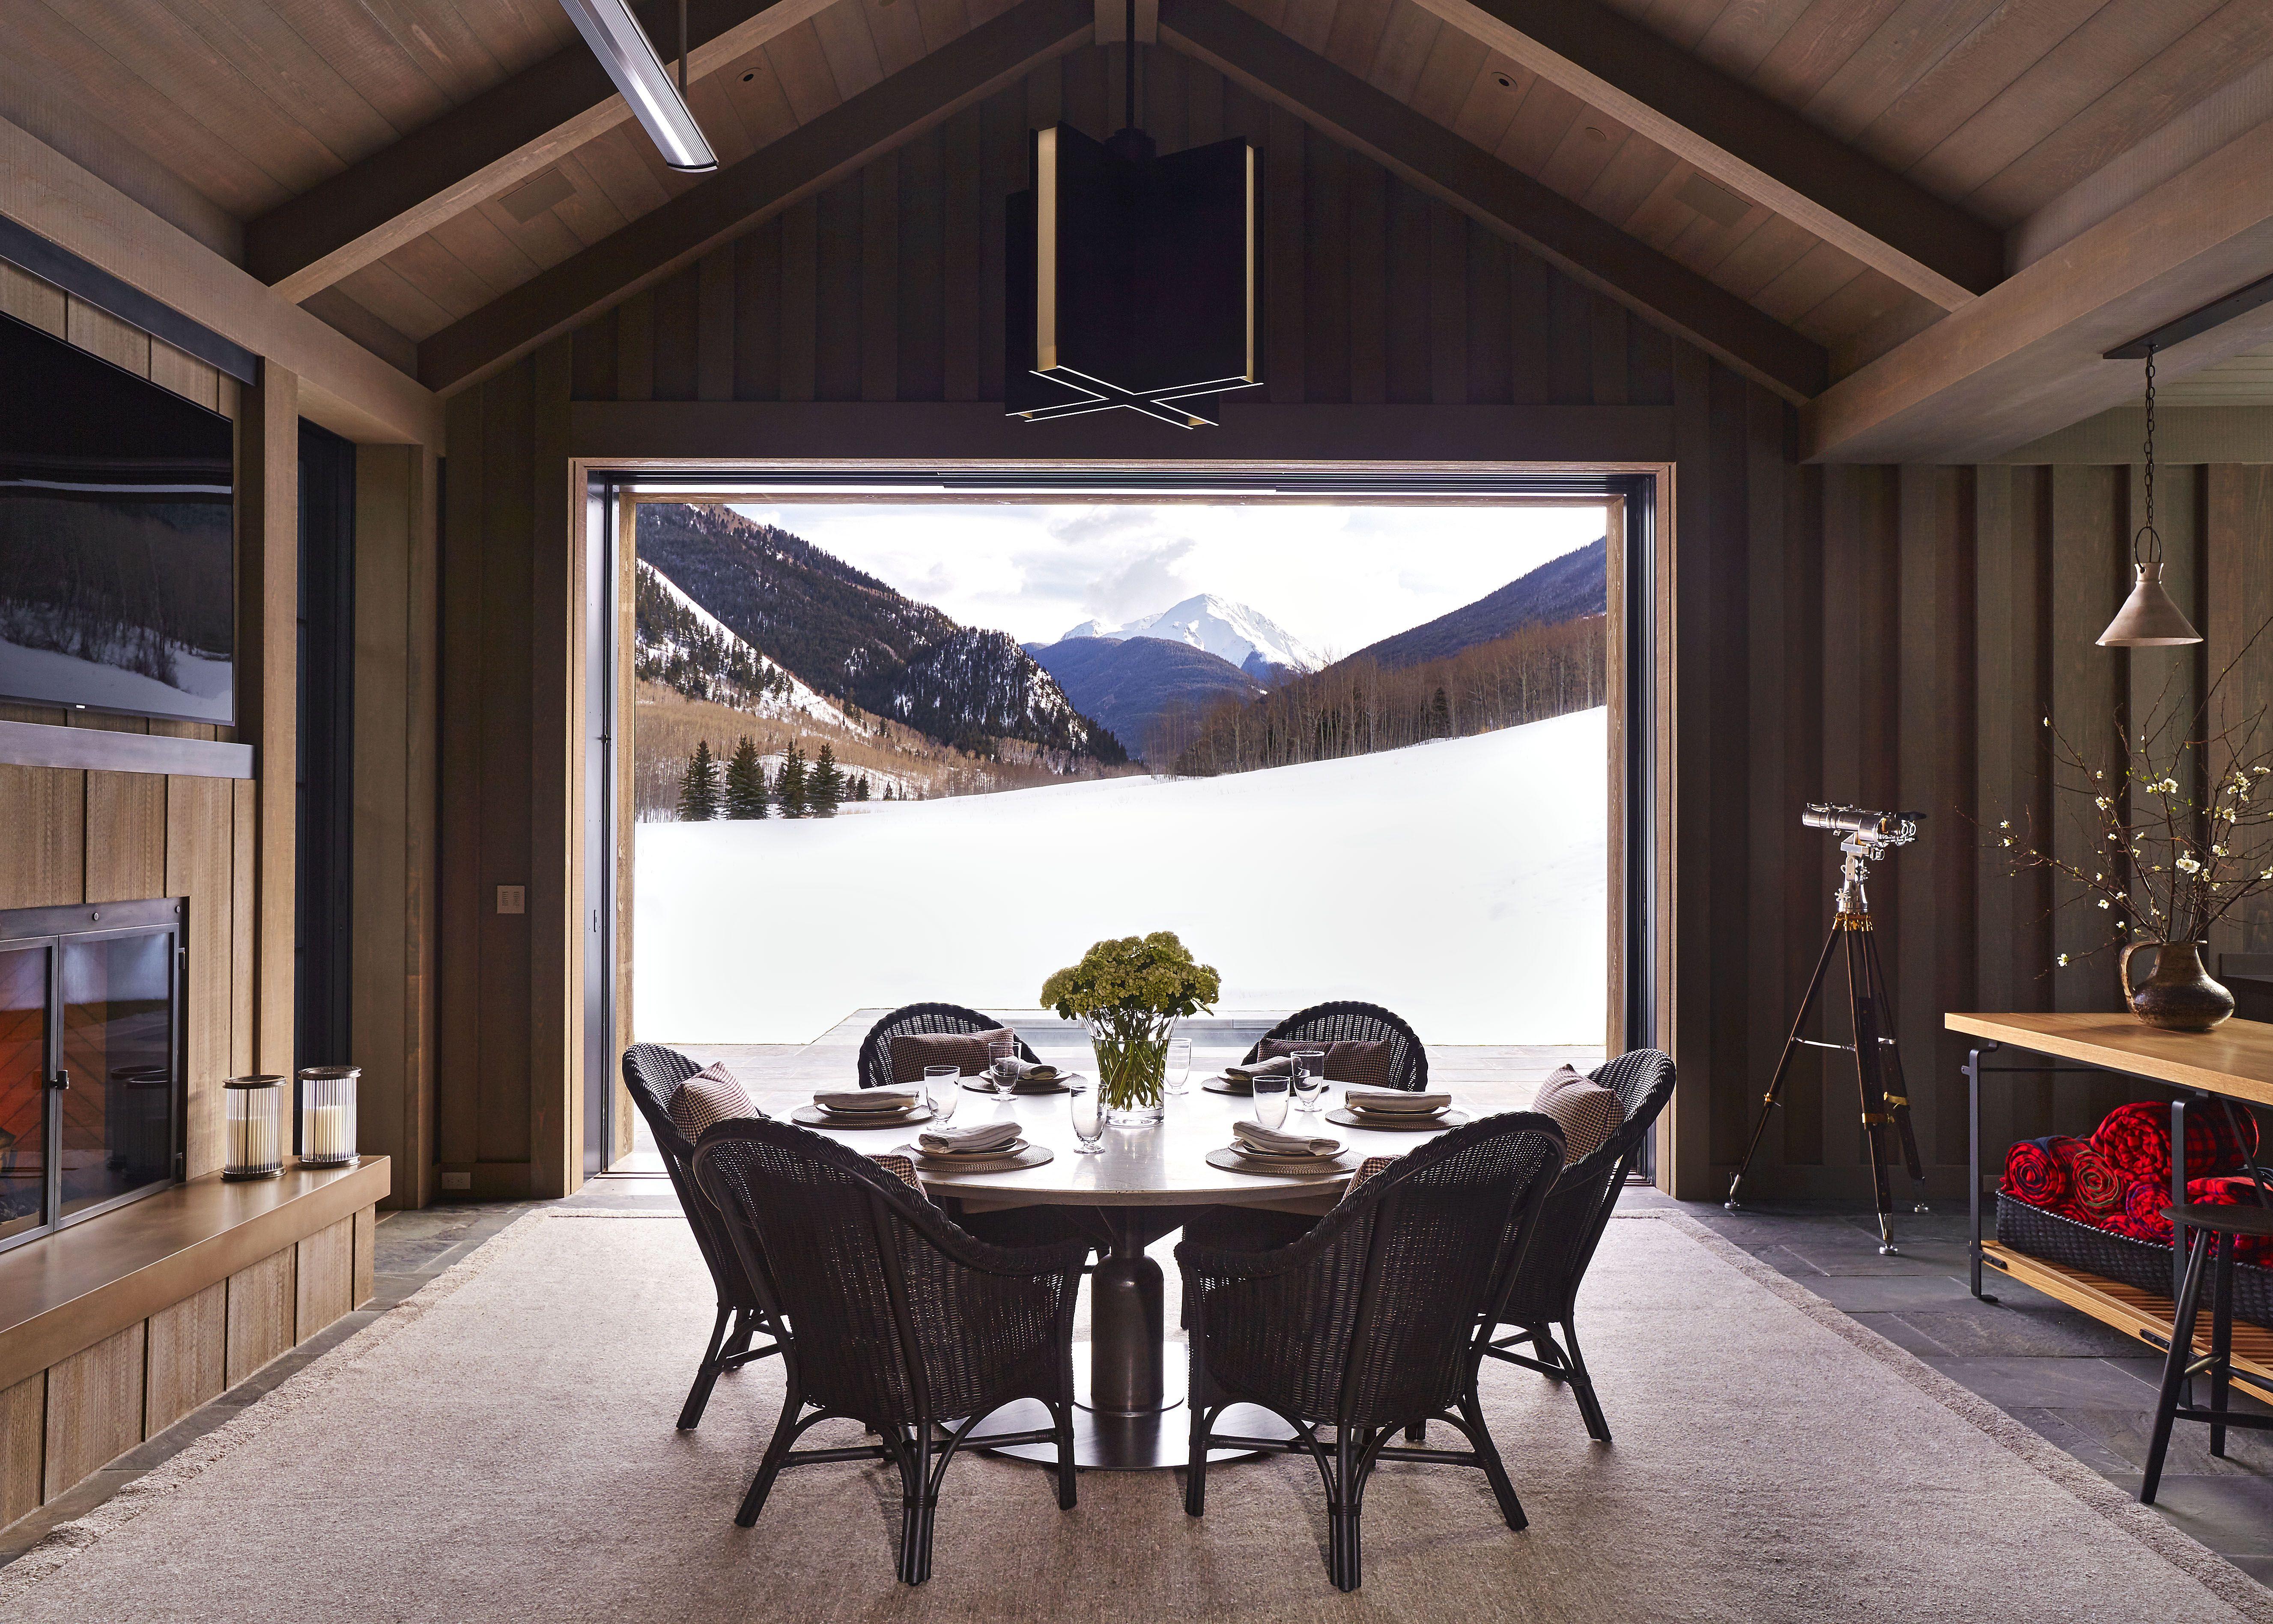 How to Design a Modern Mountain Home - Brad Krefman Aspen House